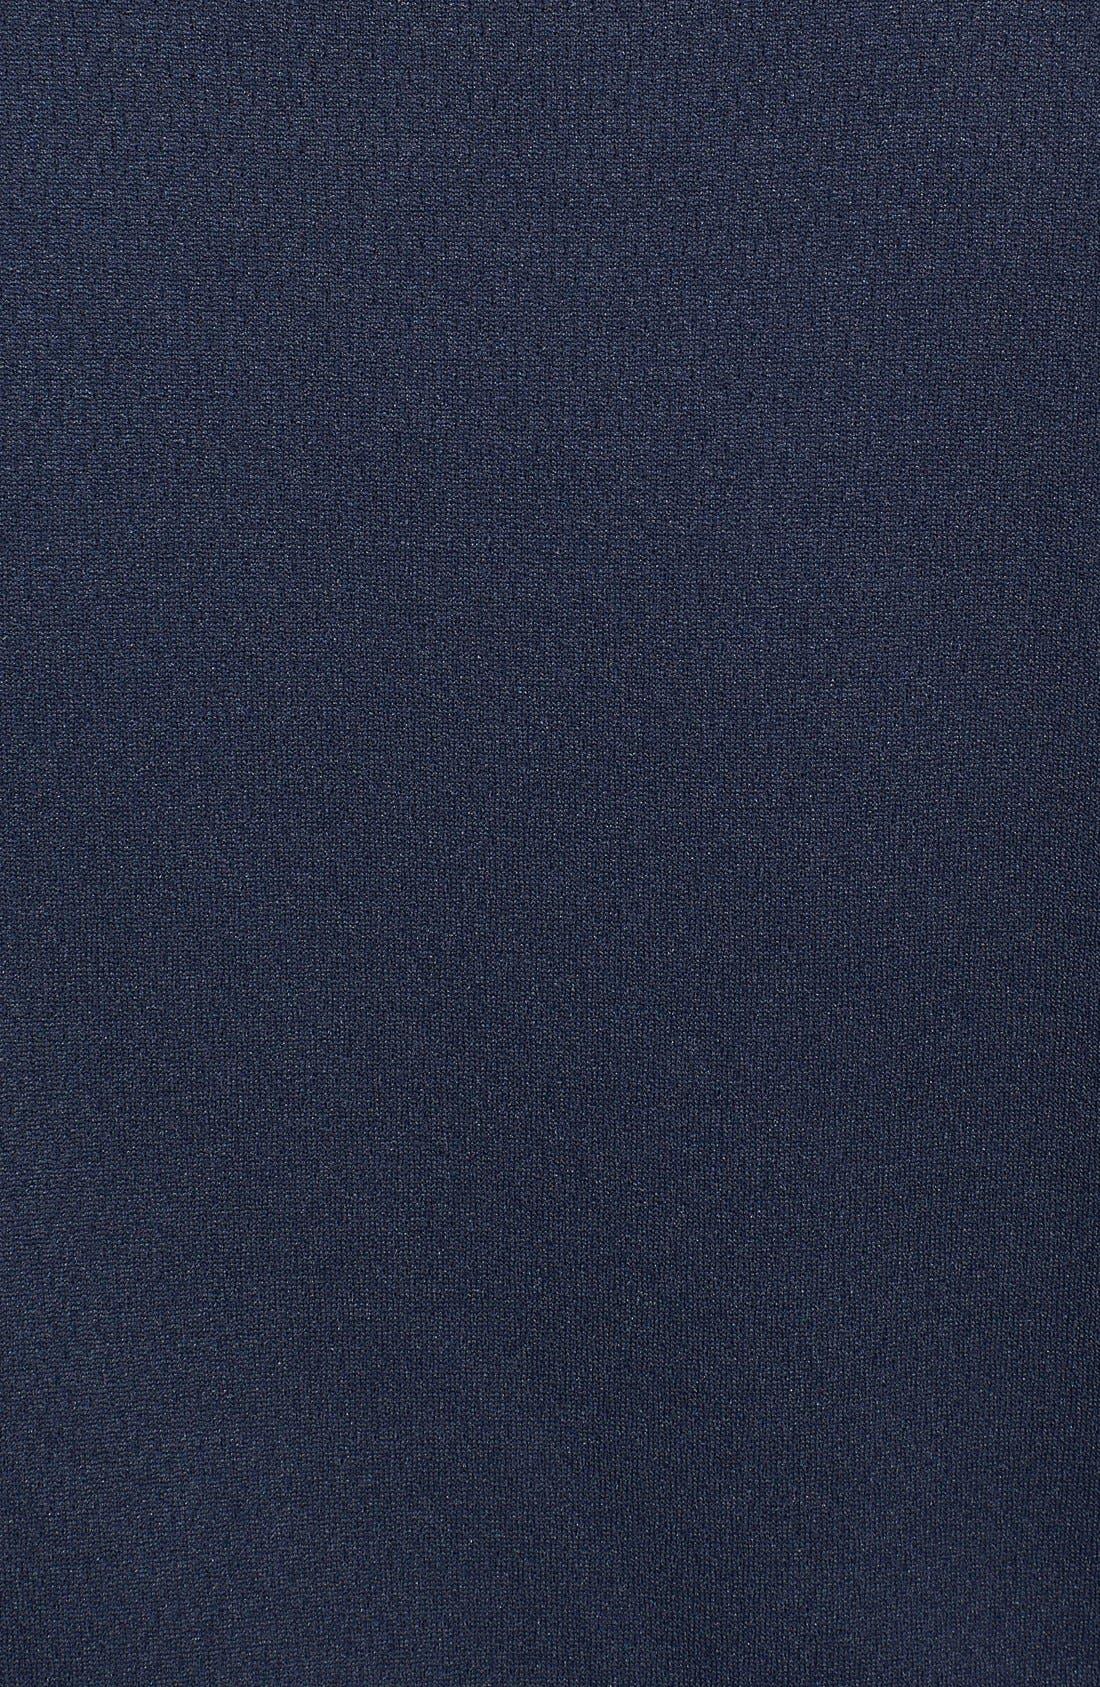 New England Patriots - Edge DryTec Moisture Wicking Half Zip Pullover,                             Alternate thumbnail 3, color,                             420